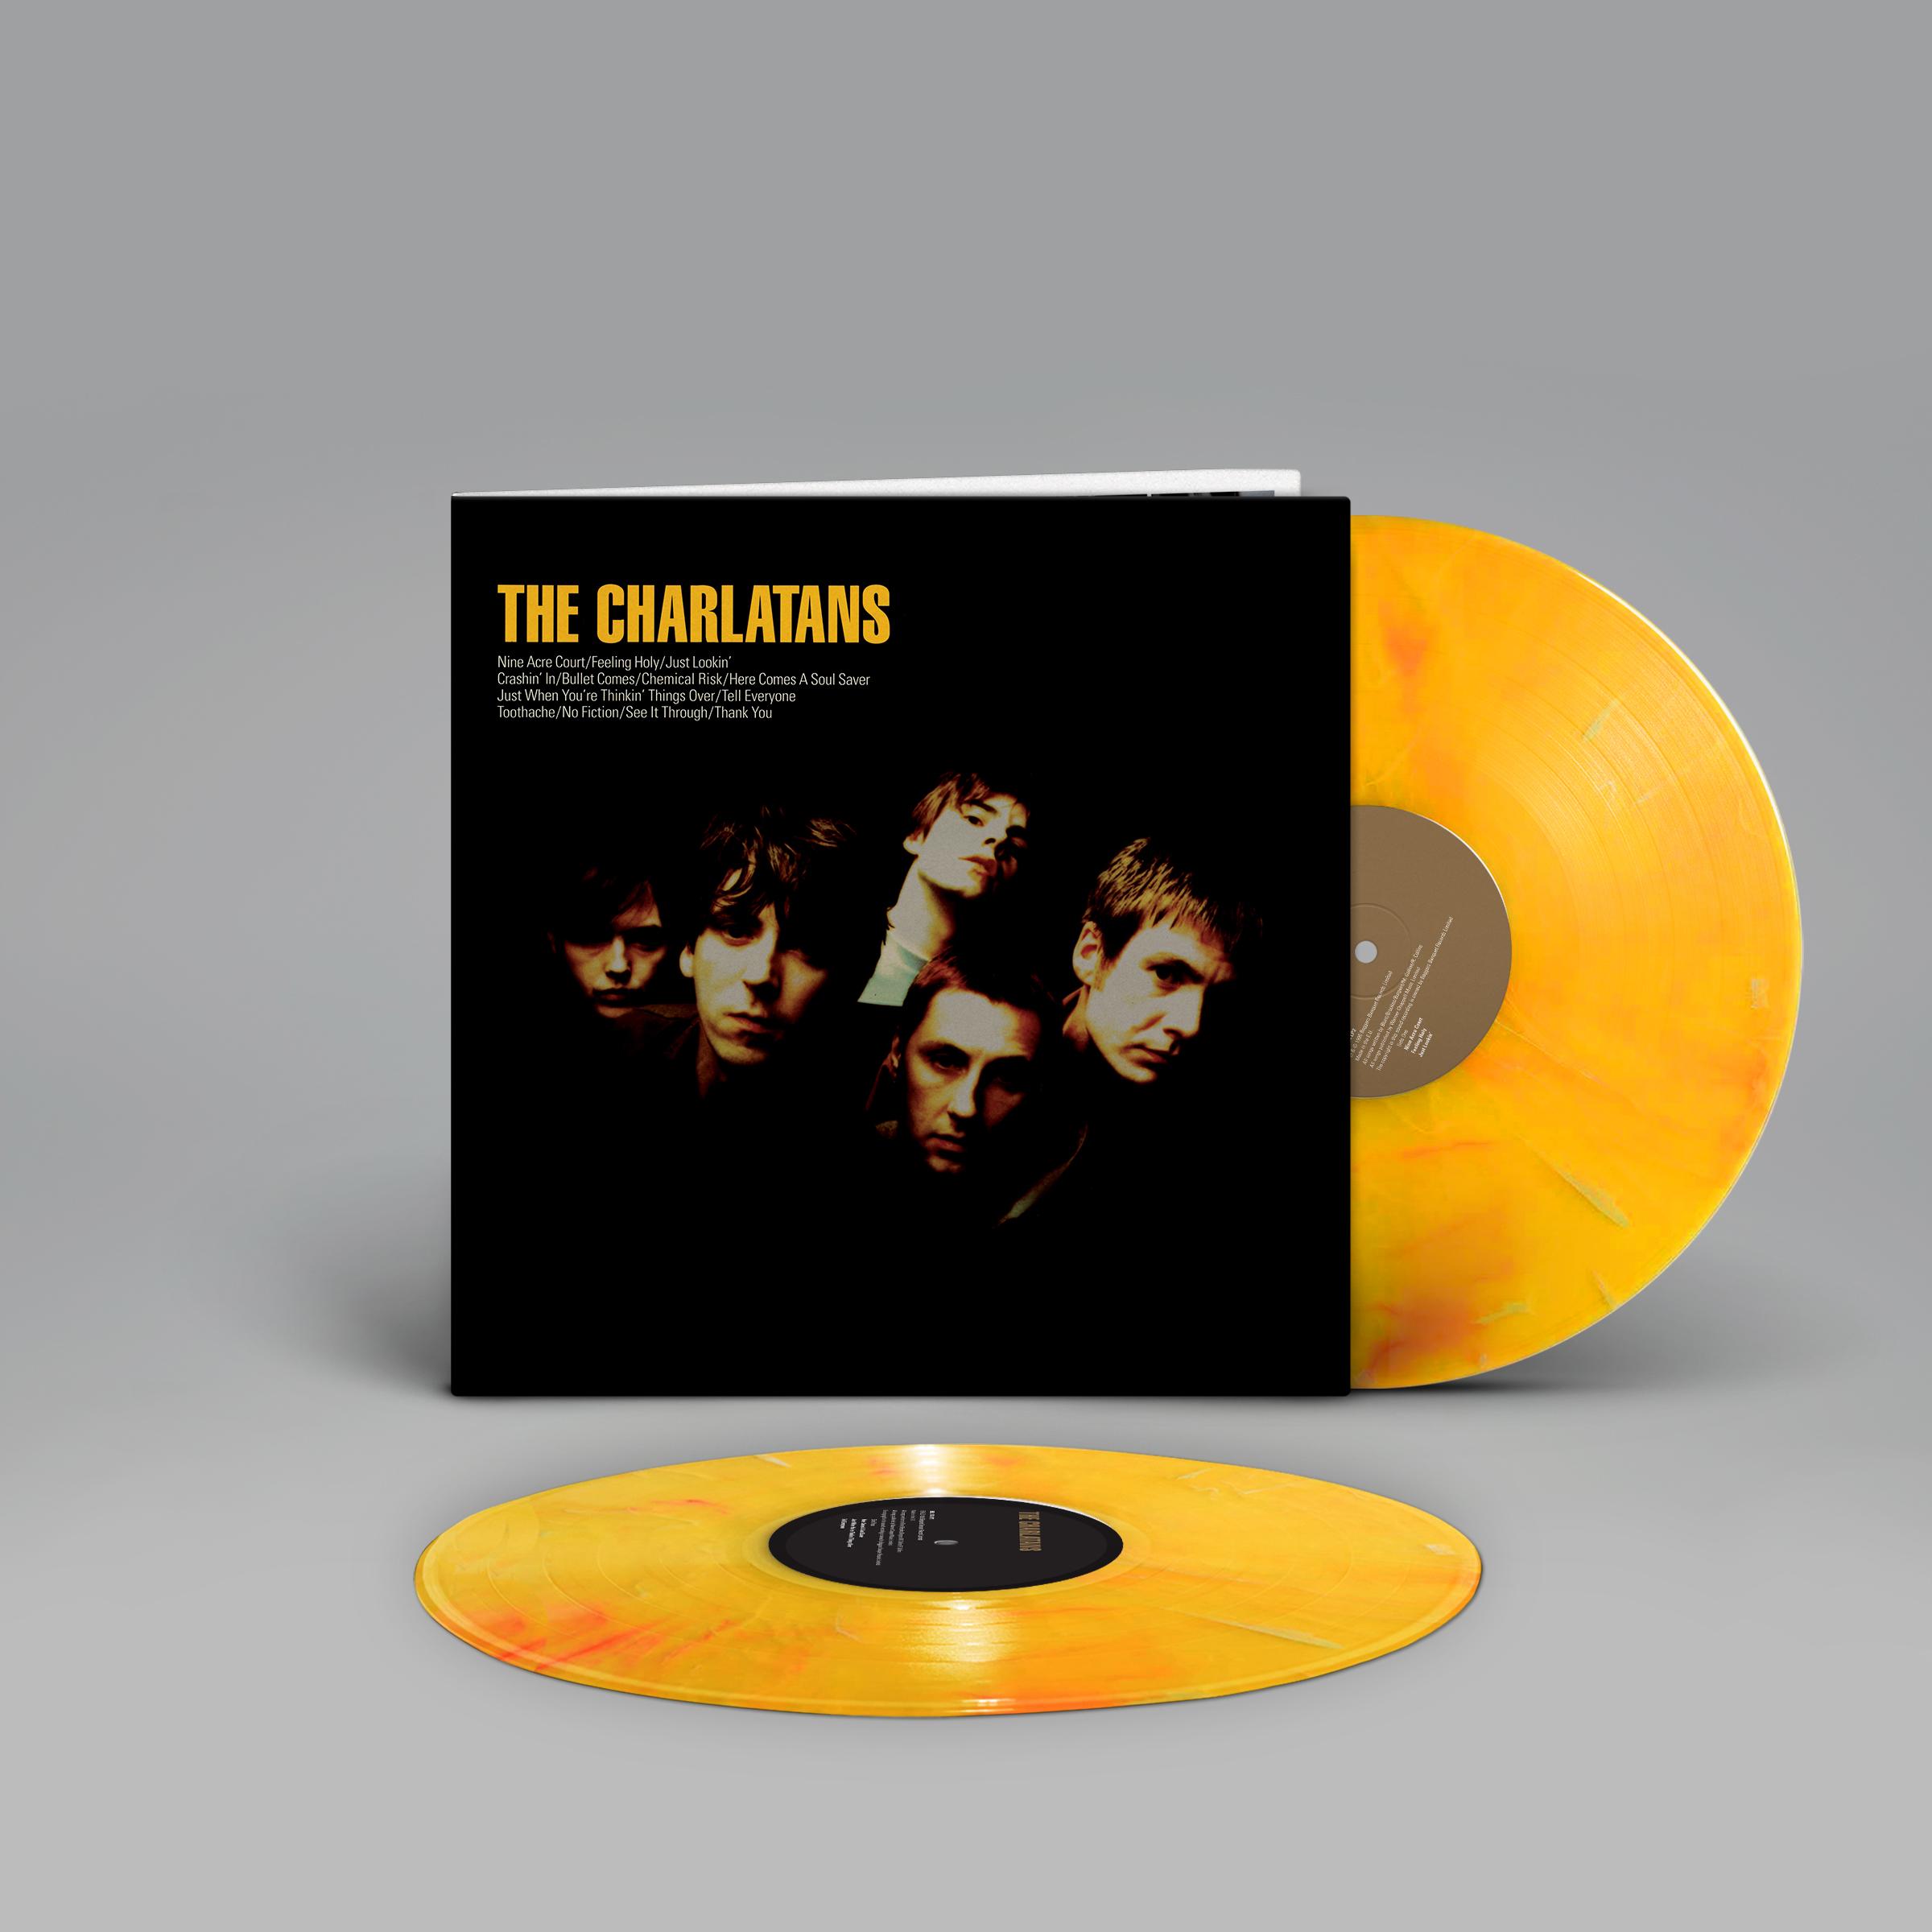 Charlatans-LP-1